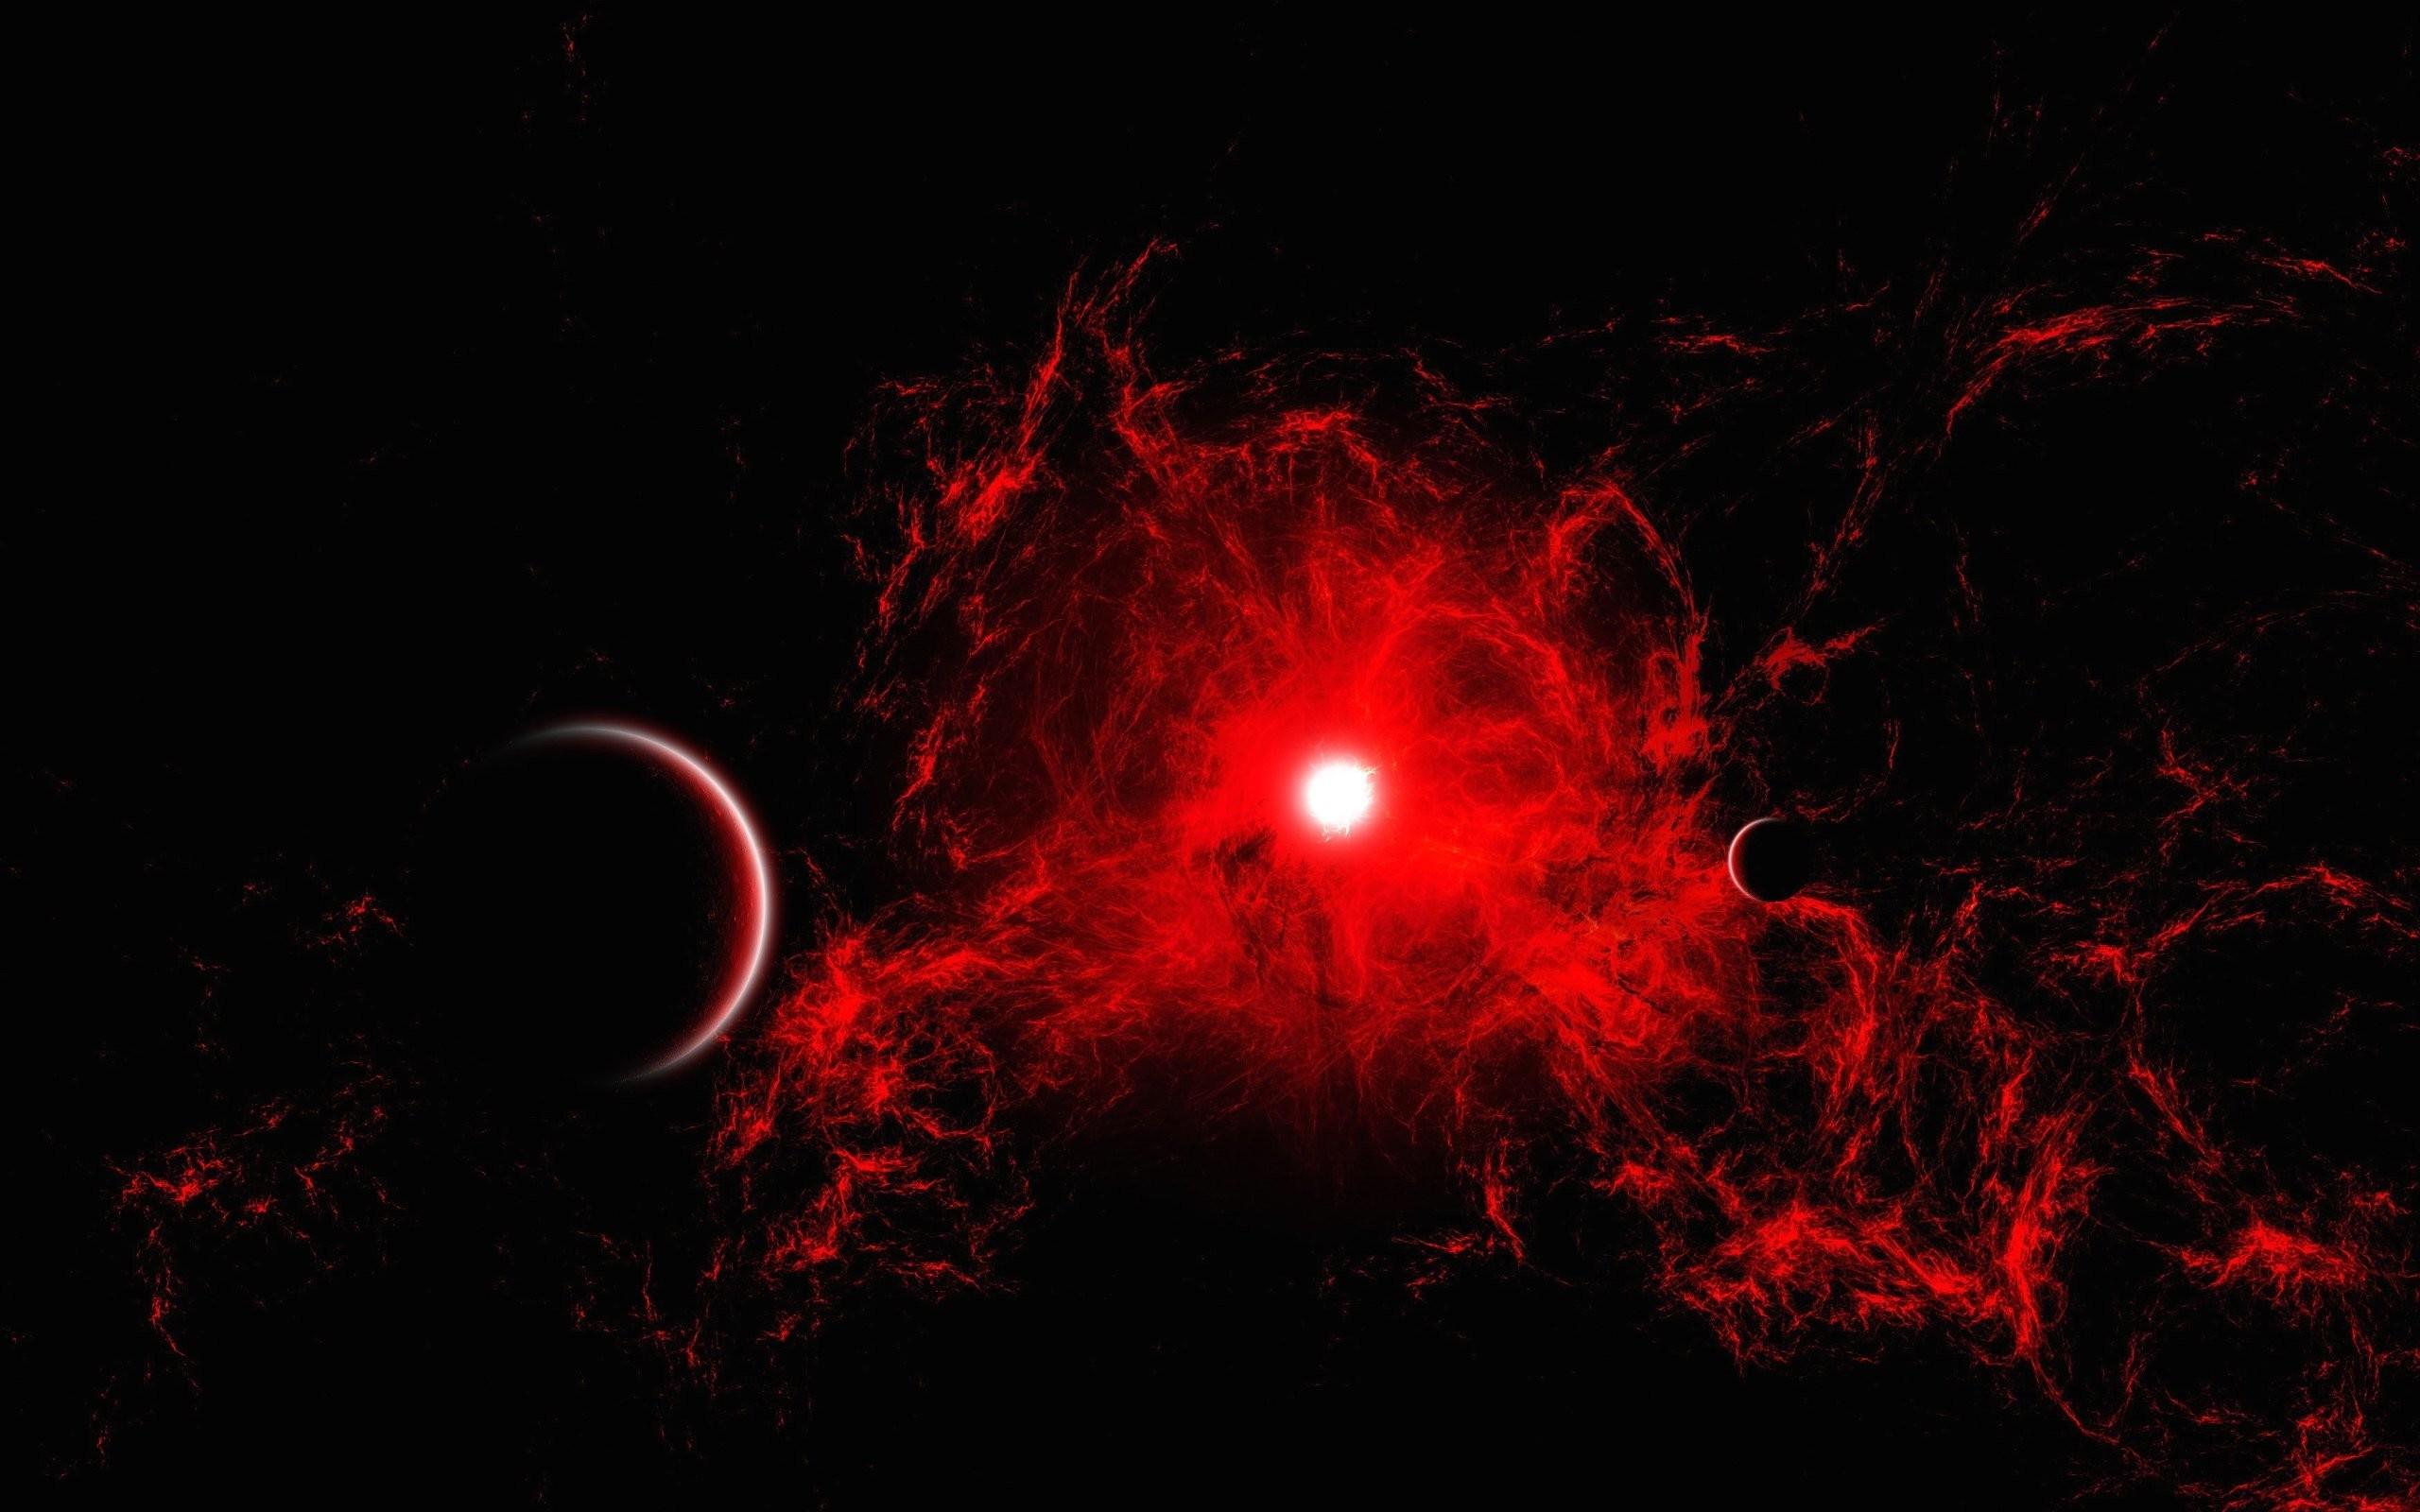 Planet red space sun wallpaper | | 437997 | WallpaperUP